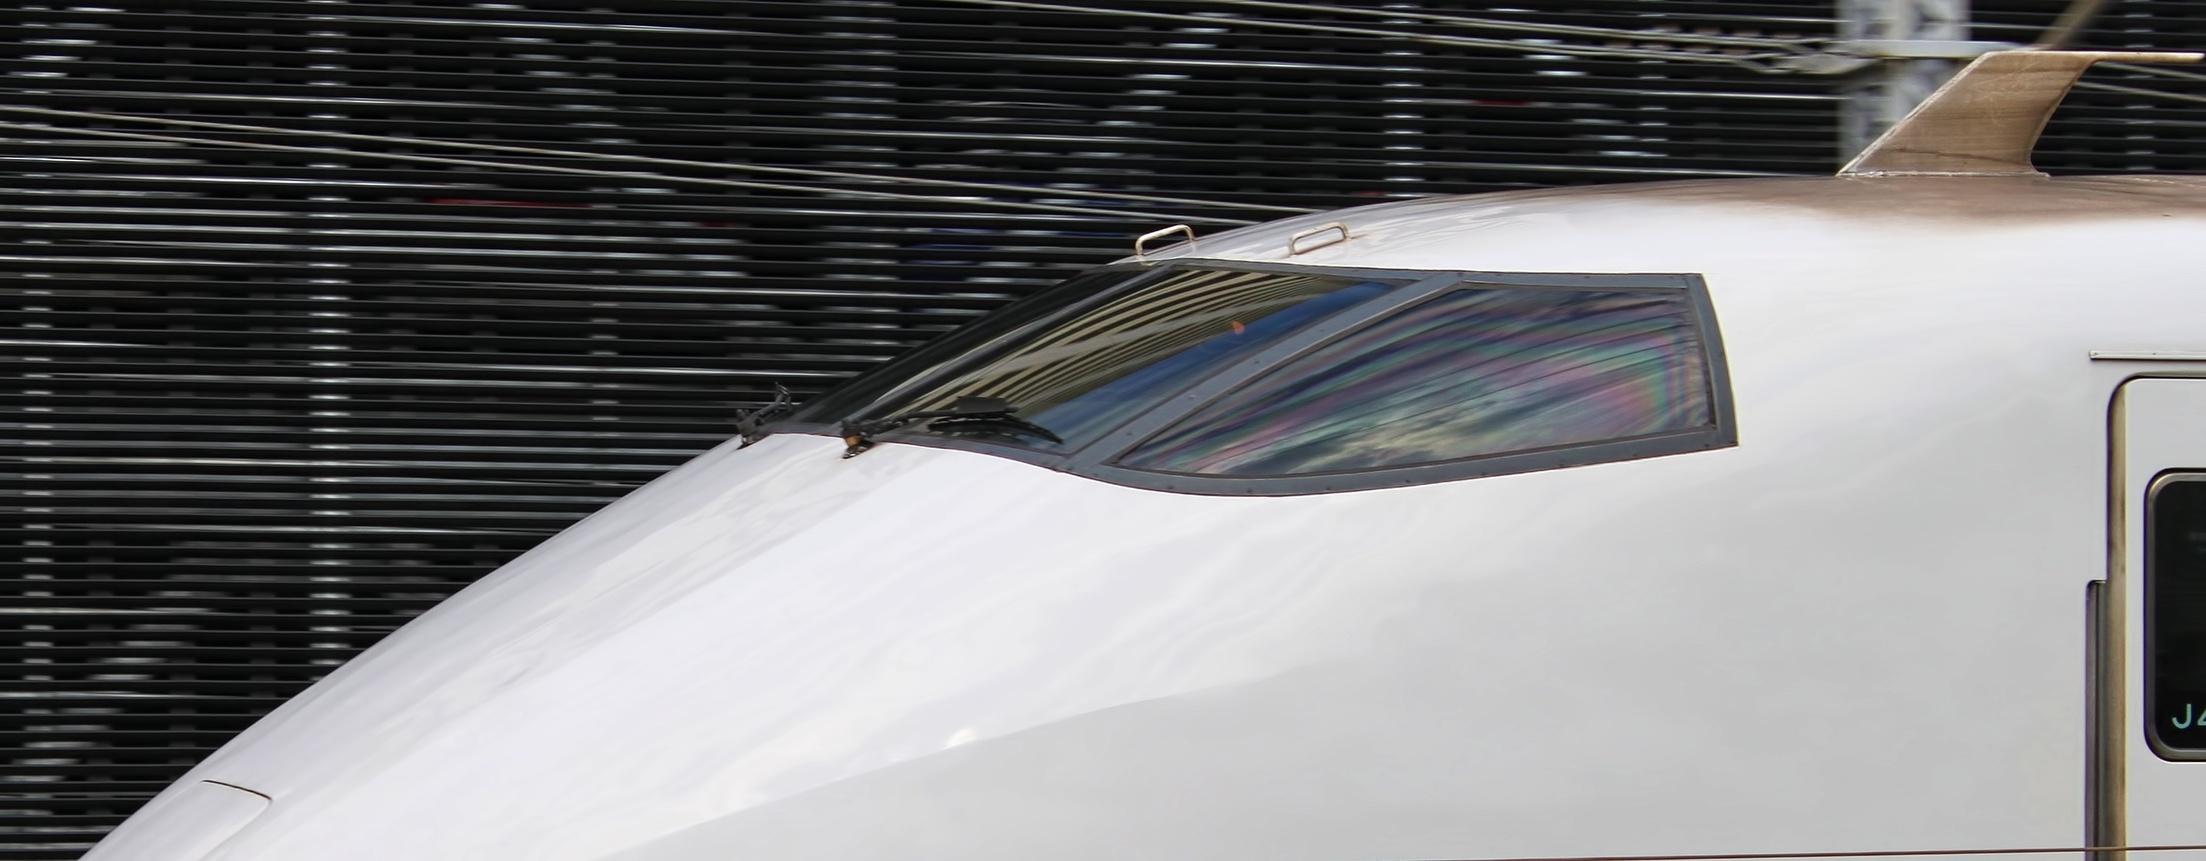 Head of the 500 Series Shinkansen